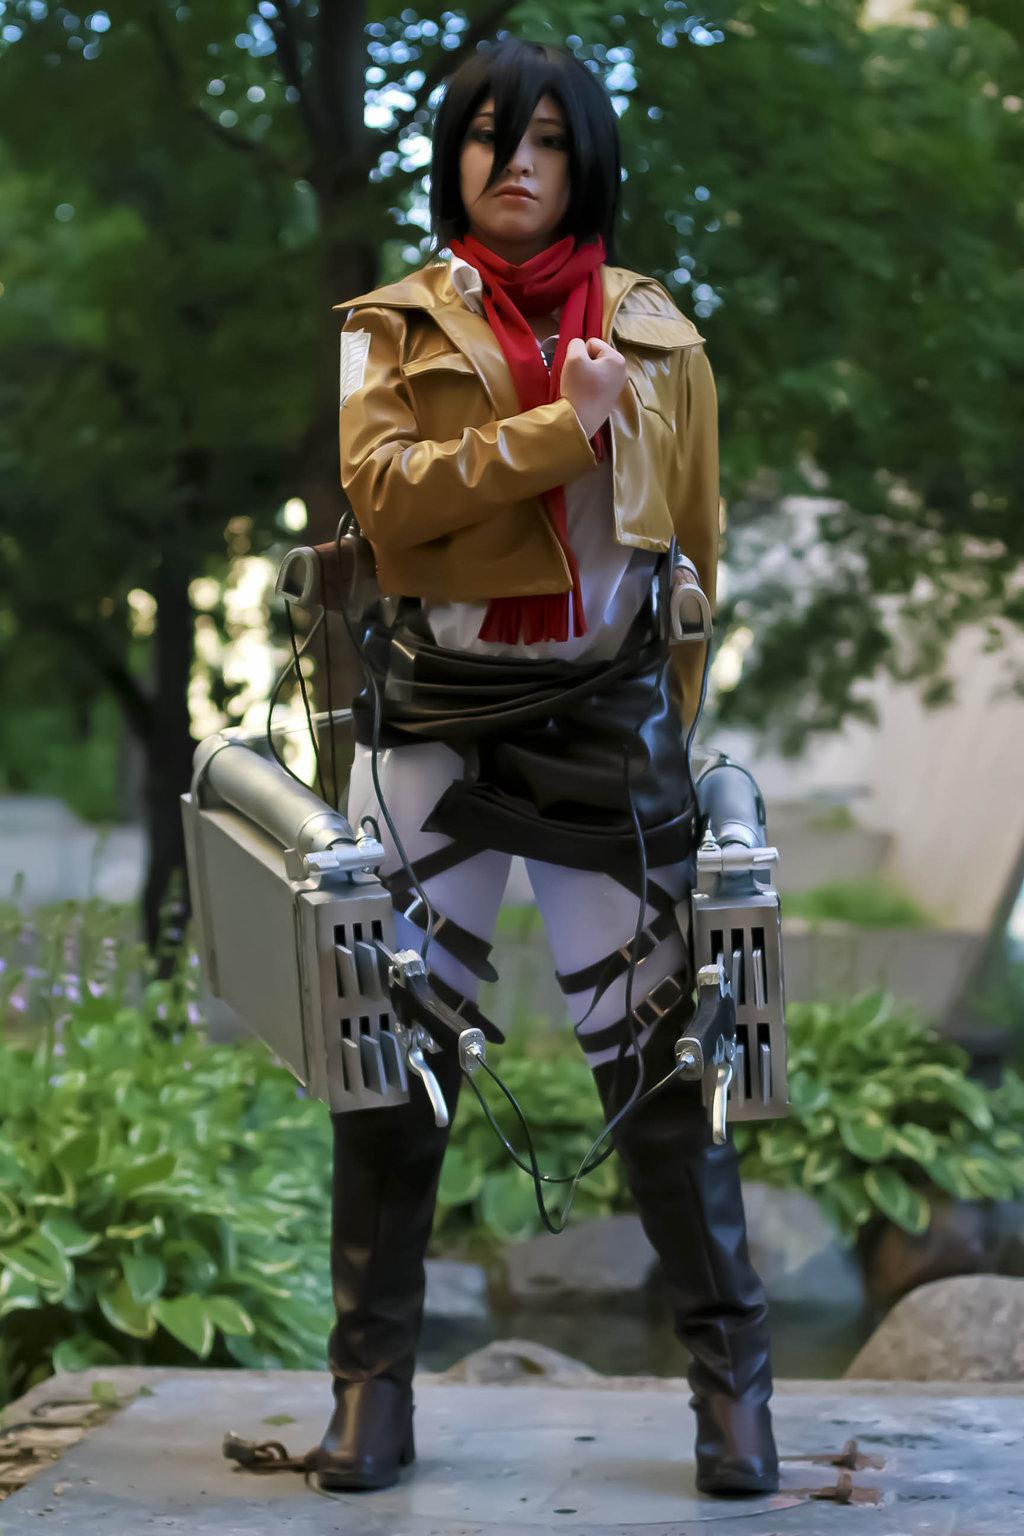 Attack on Titan Mikasa Ackerman Cosplay   Attack On Titan